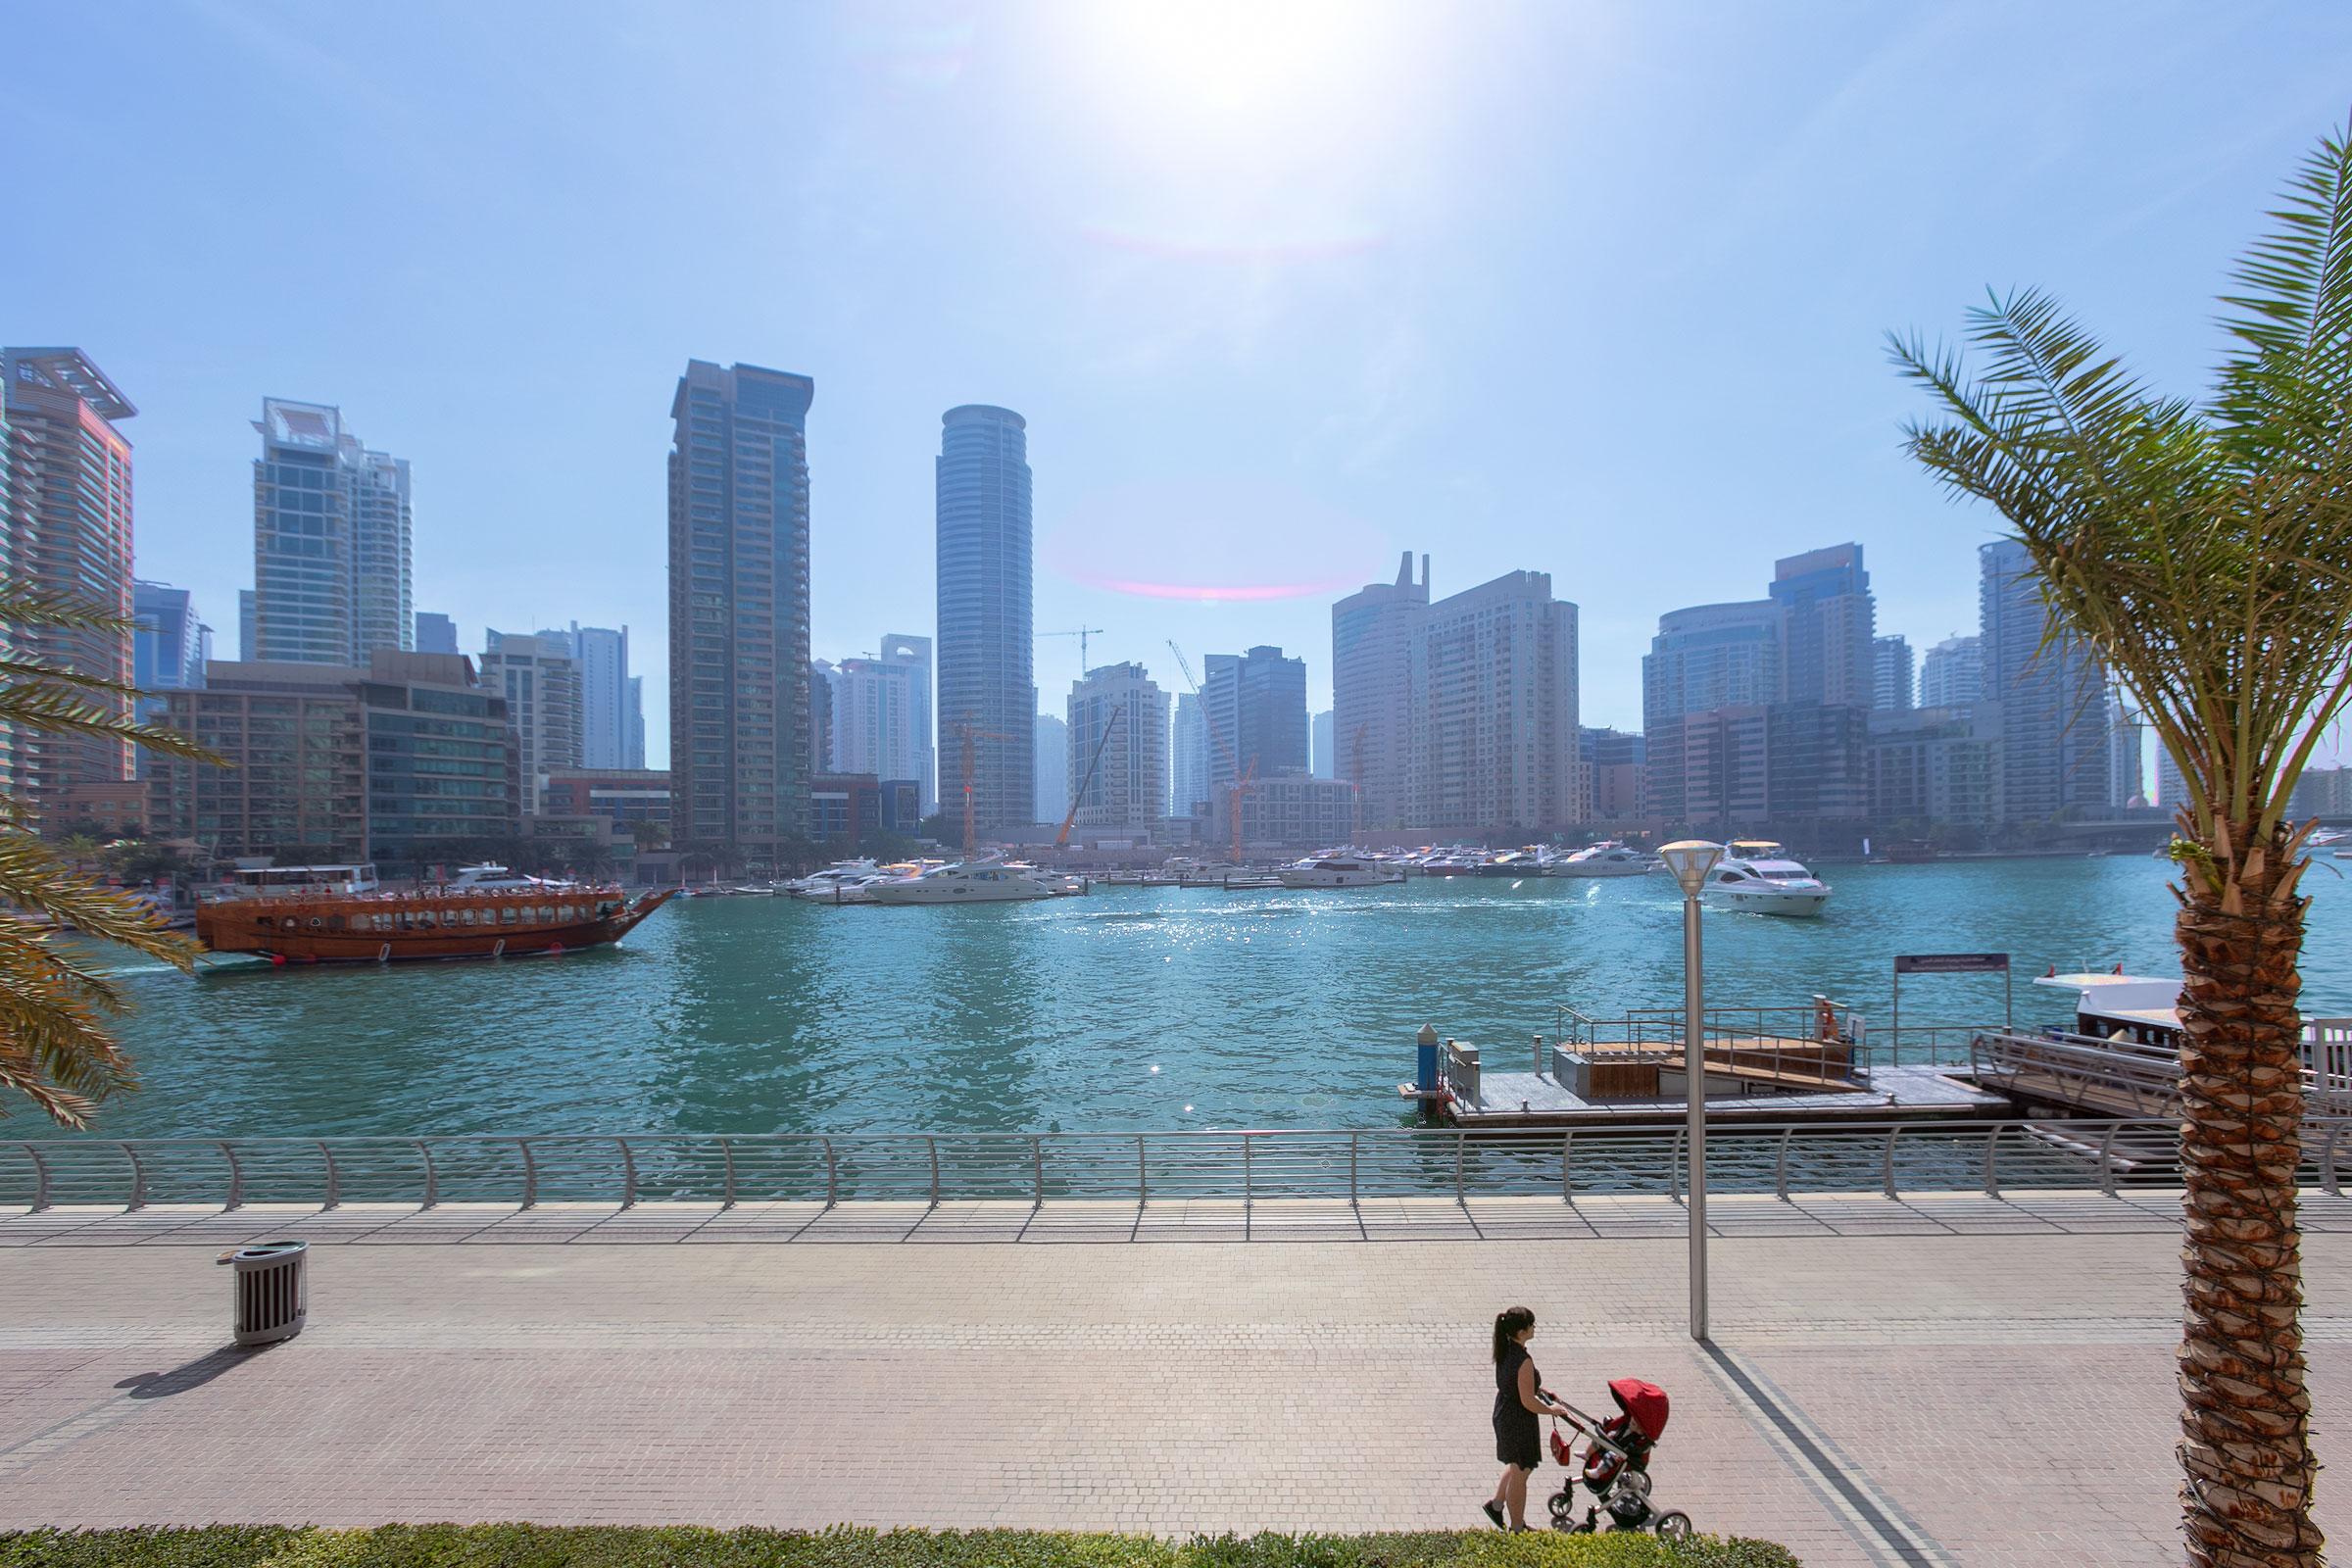 Astounding! Full Marina View | Available